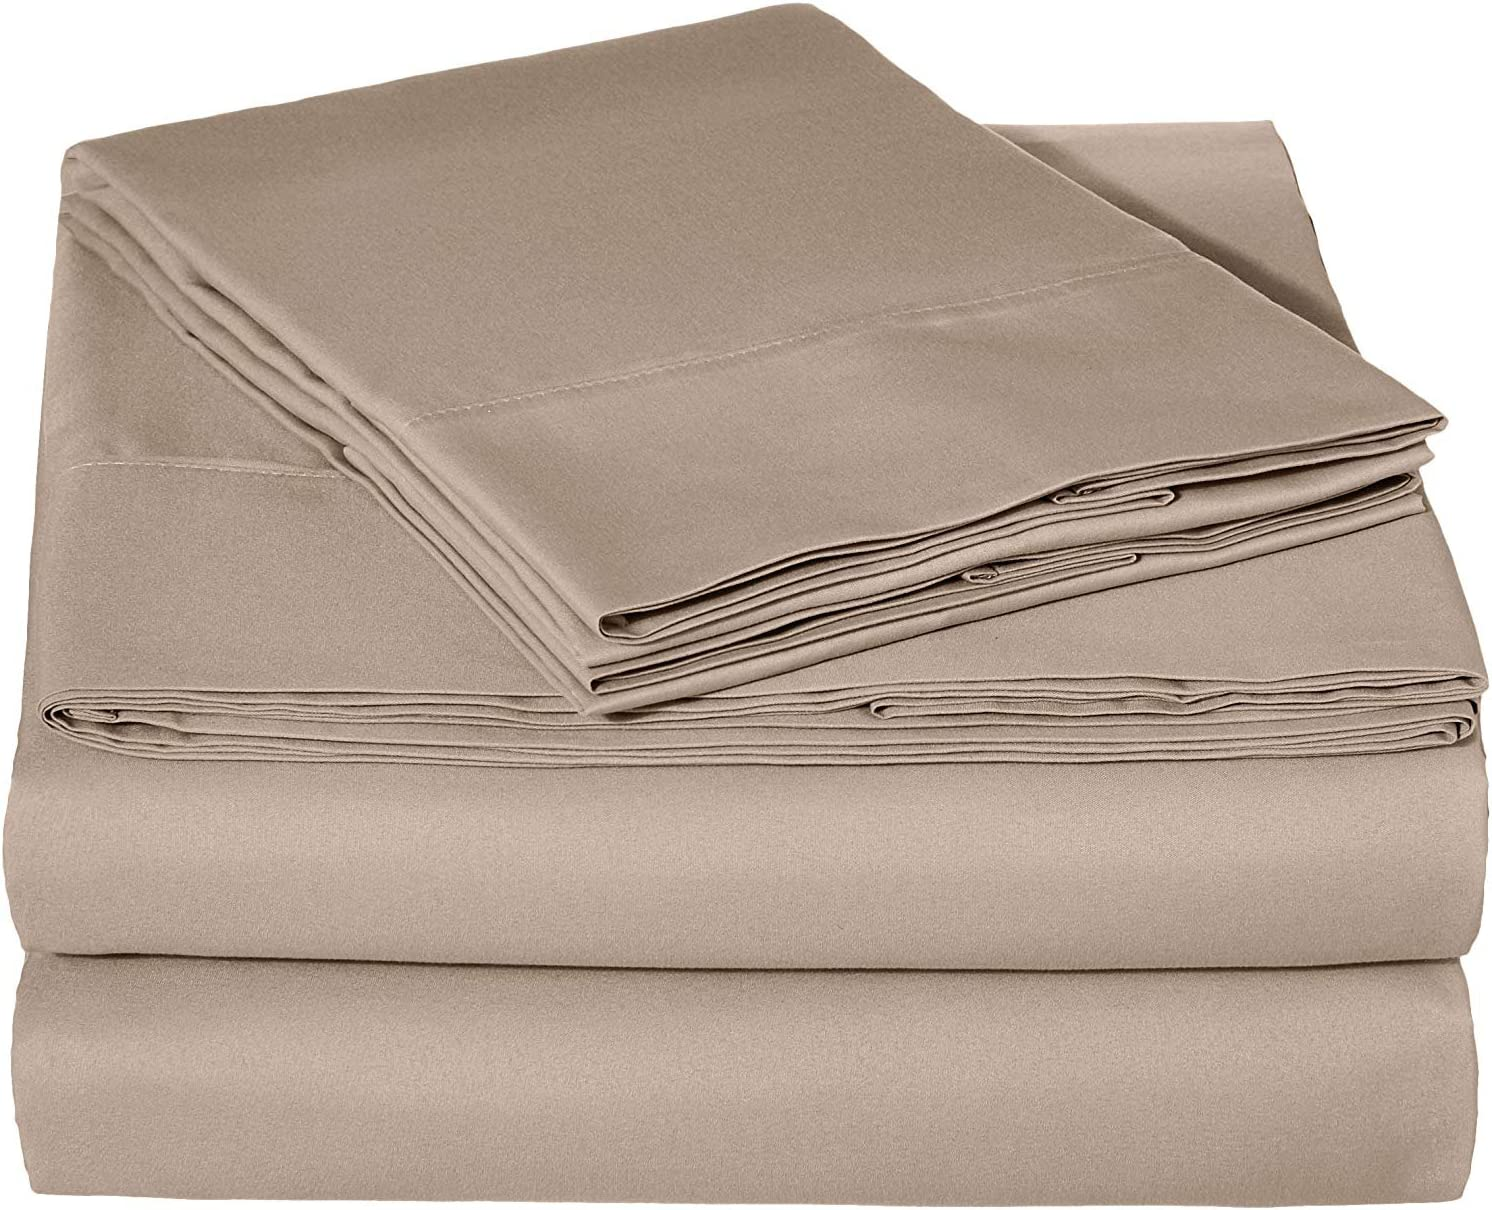 Kanak Bedding 誕生日 お祝い Solid Sheet Cotton 新作からSALEアイテム等お得な商品 満載 Set-King Size Set-Organic